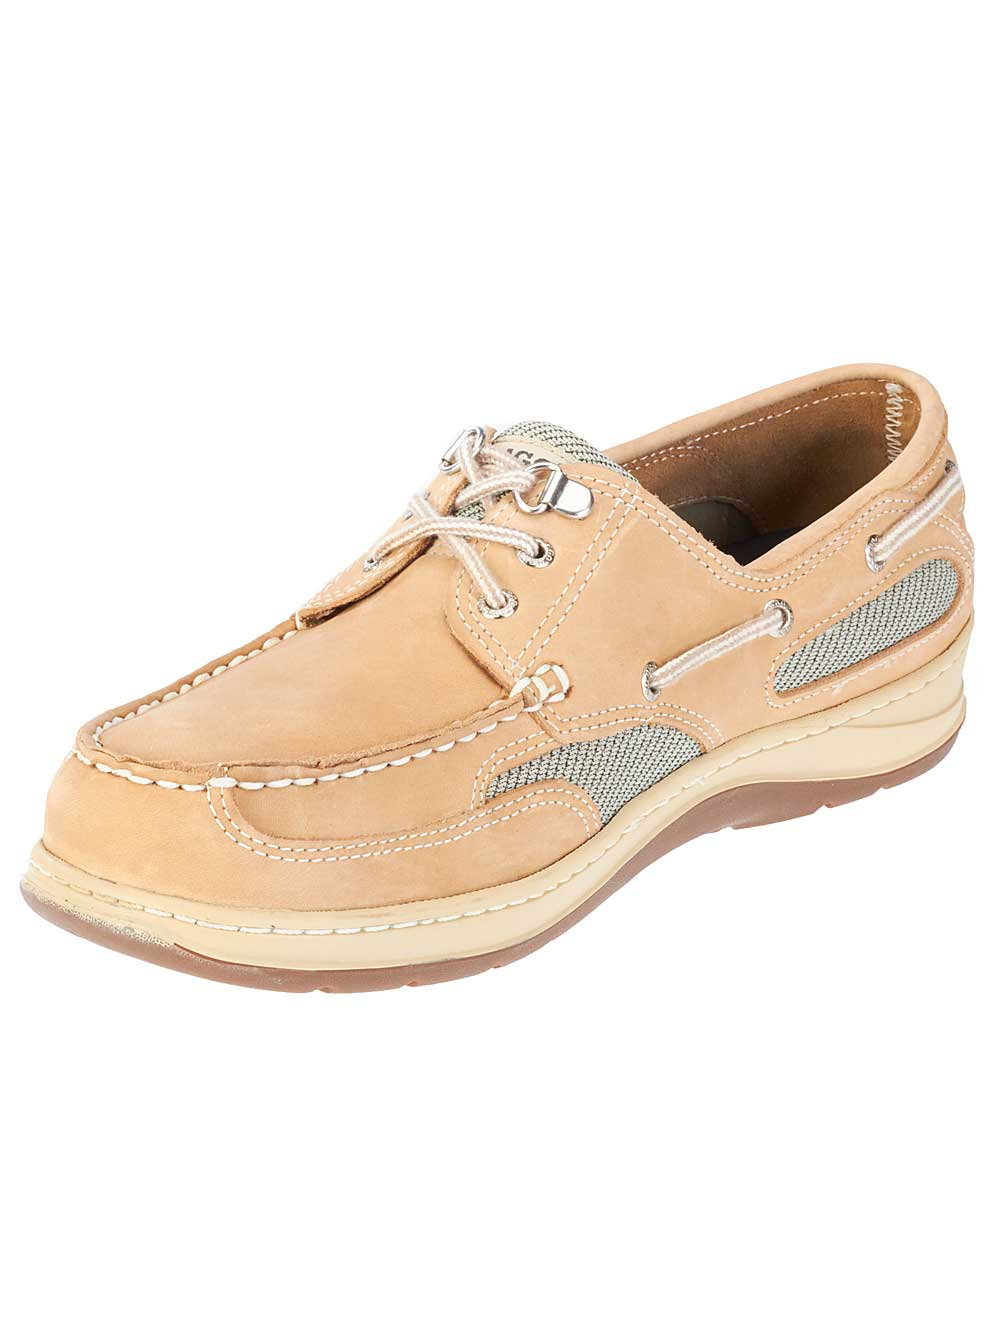 Sebago Mens Clovehitch II Boat Shoes in Taupe Nubuck